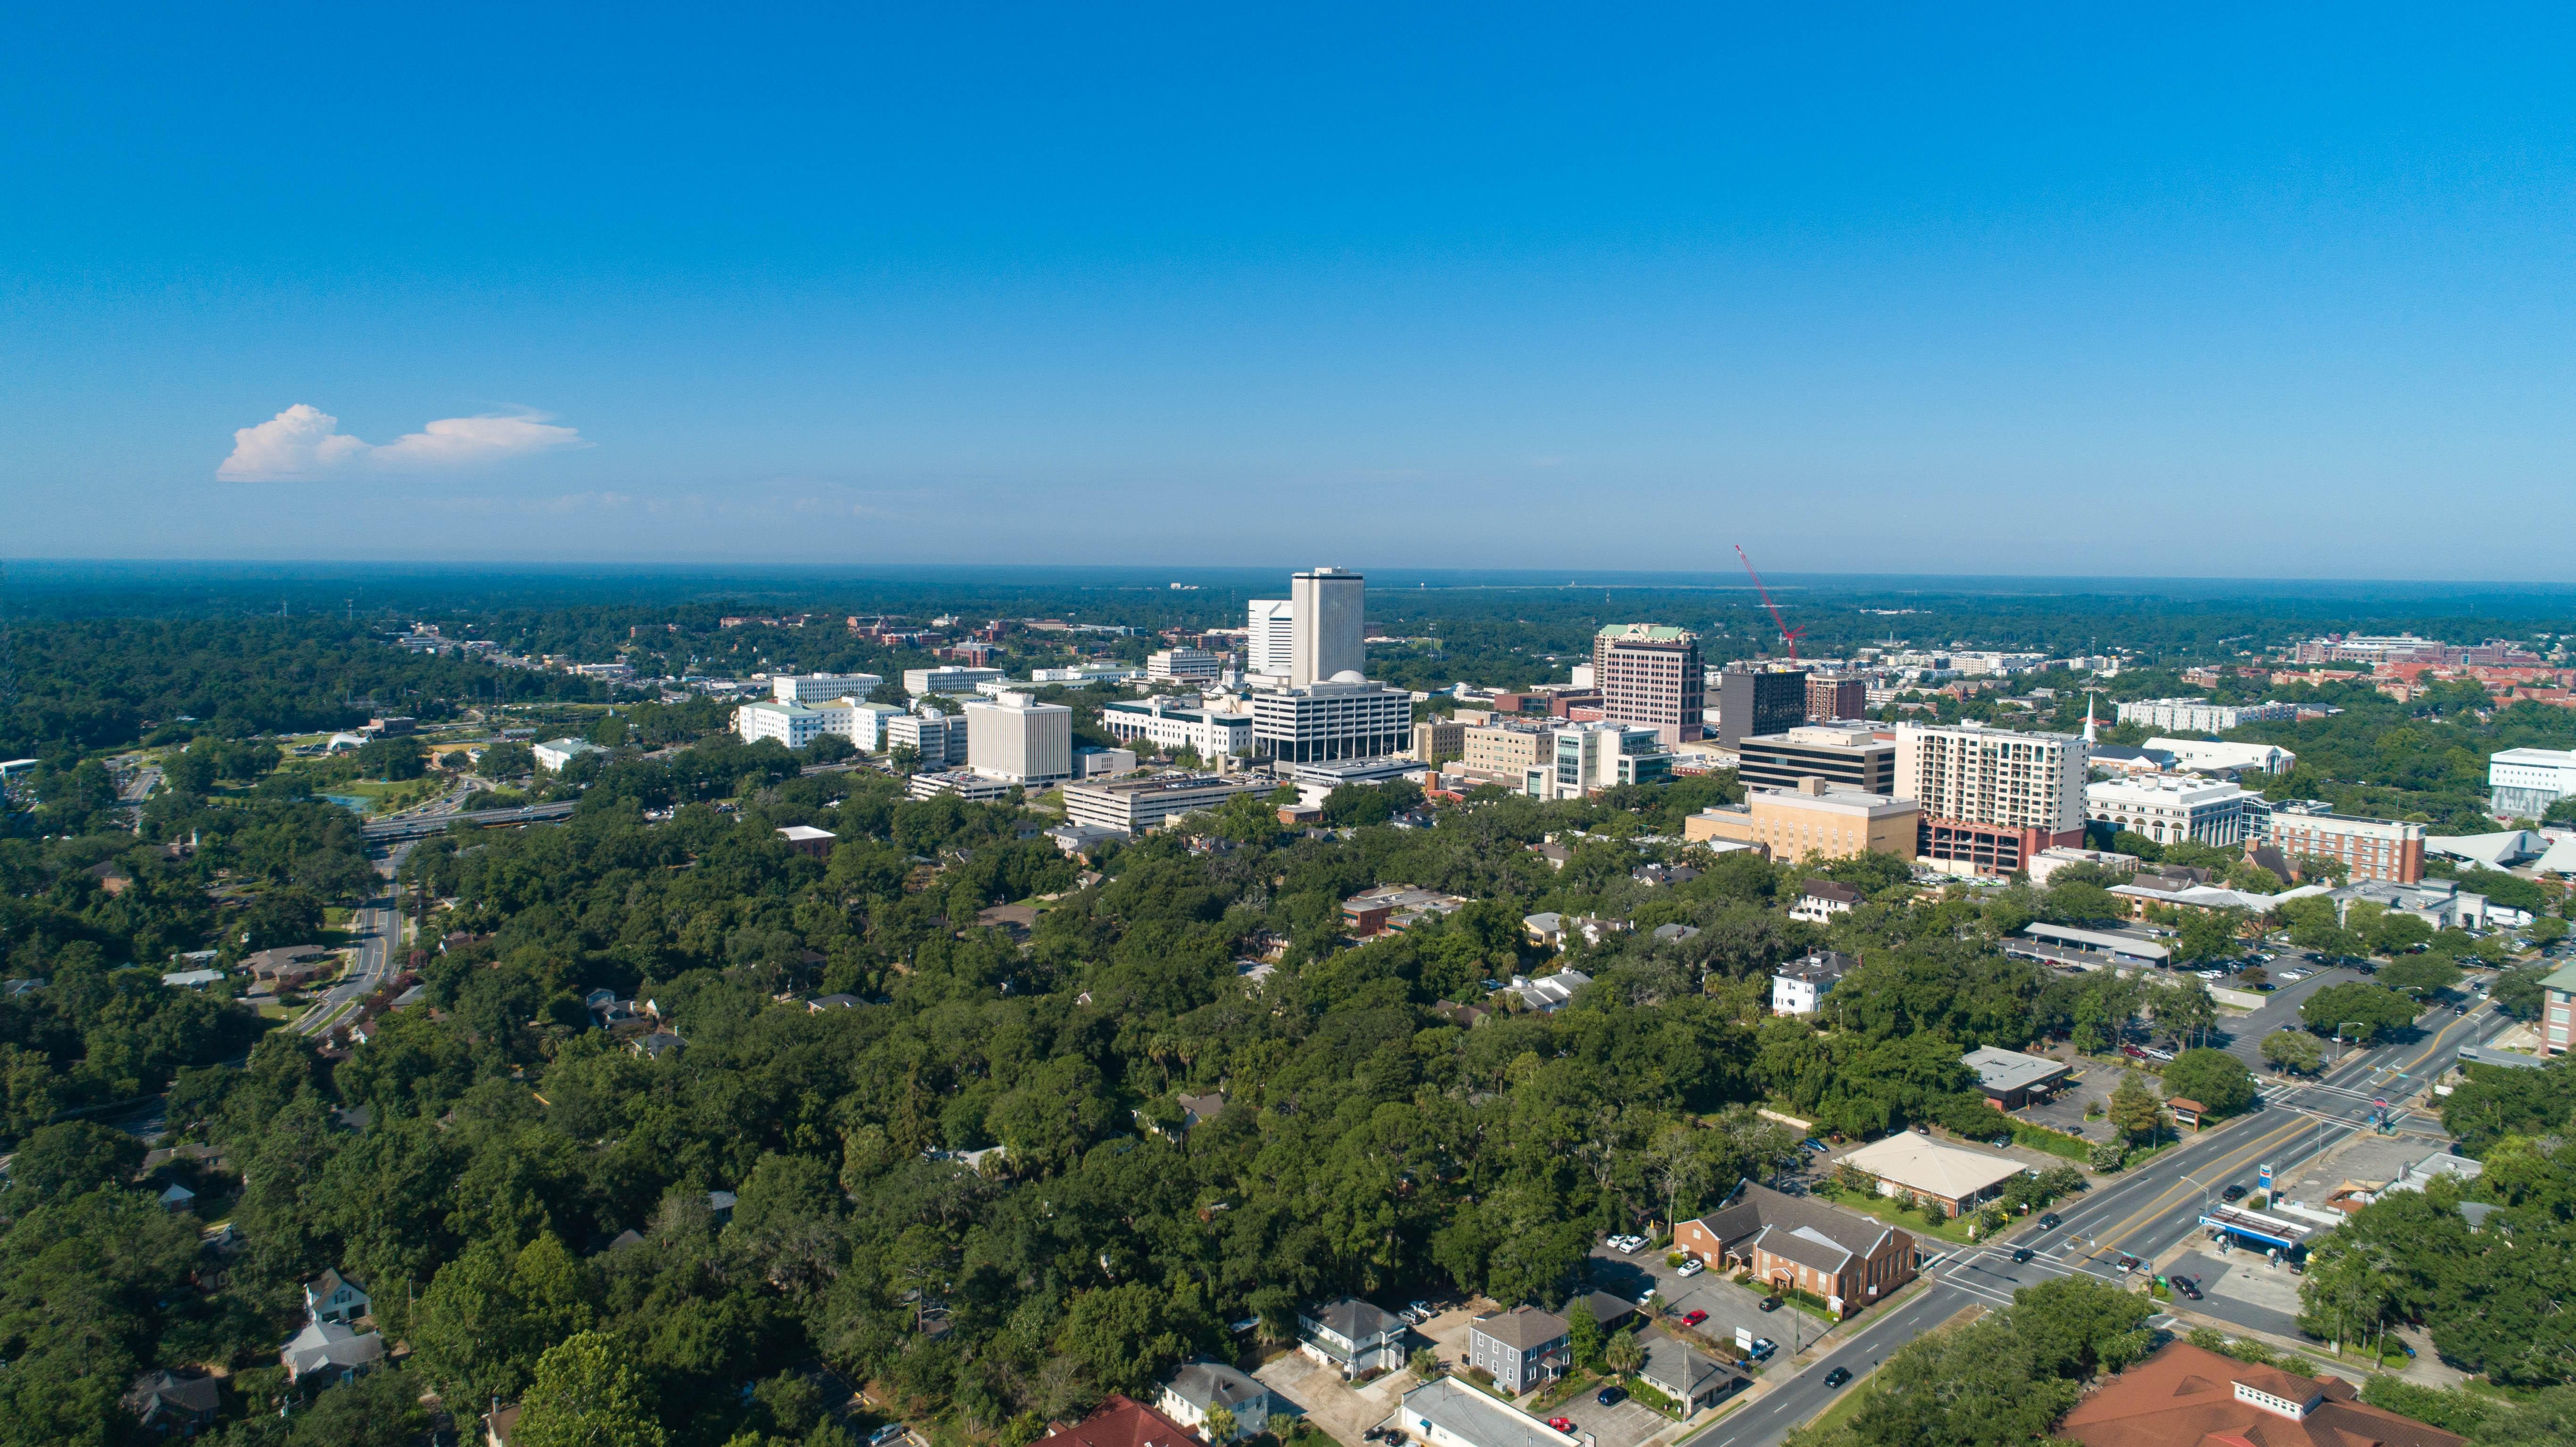 City of Tallahassee | LinkedIn